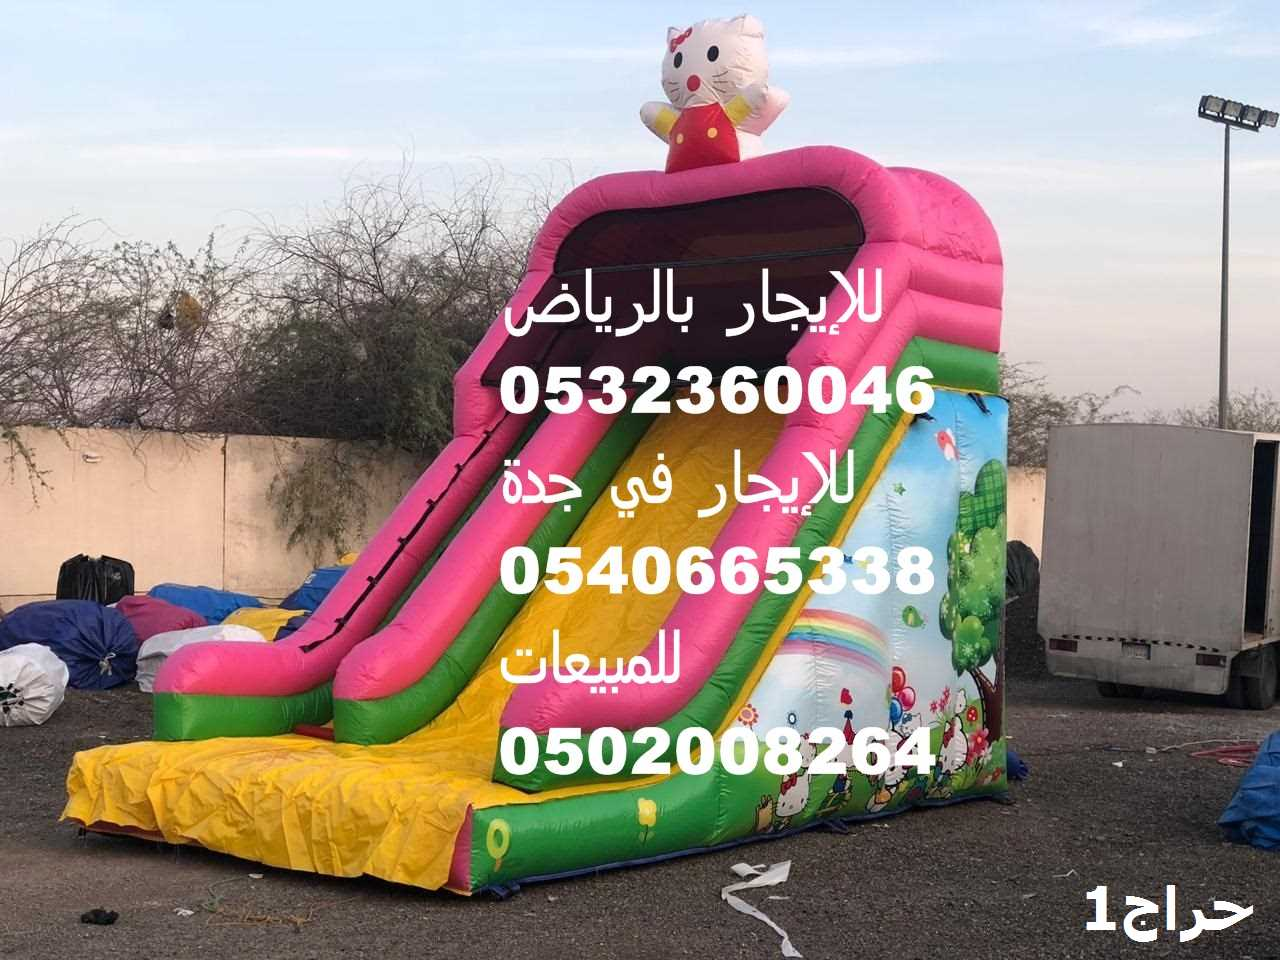 http://haraj1.com/images/imagesupload/12071/0c11efd89ad84ad987268edda14846cd/b5c6ab7e-4e88-478b-b7c1-69796018e75f.jpg